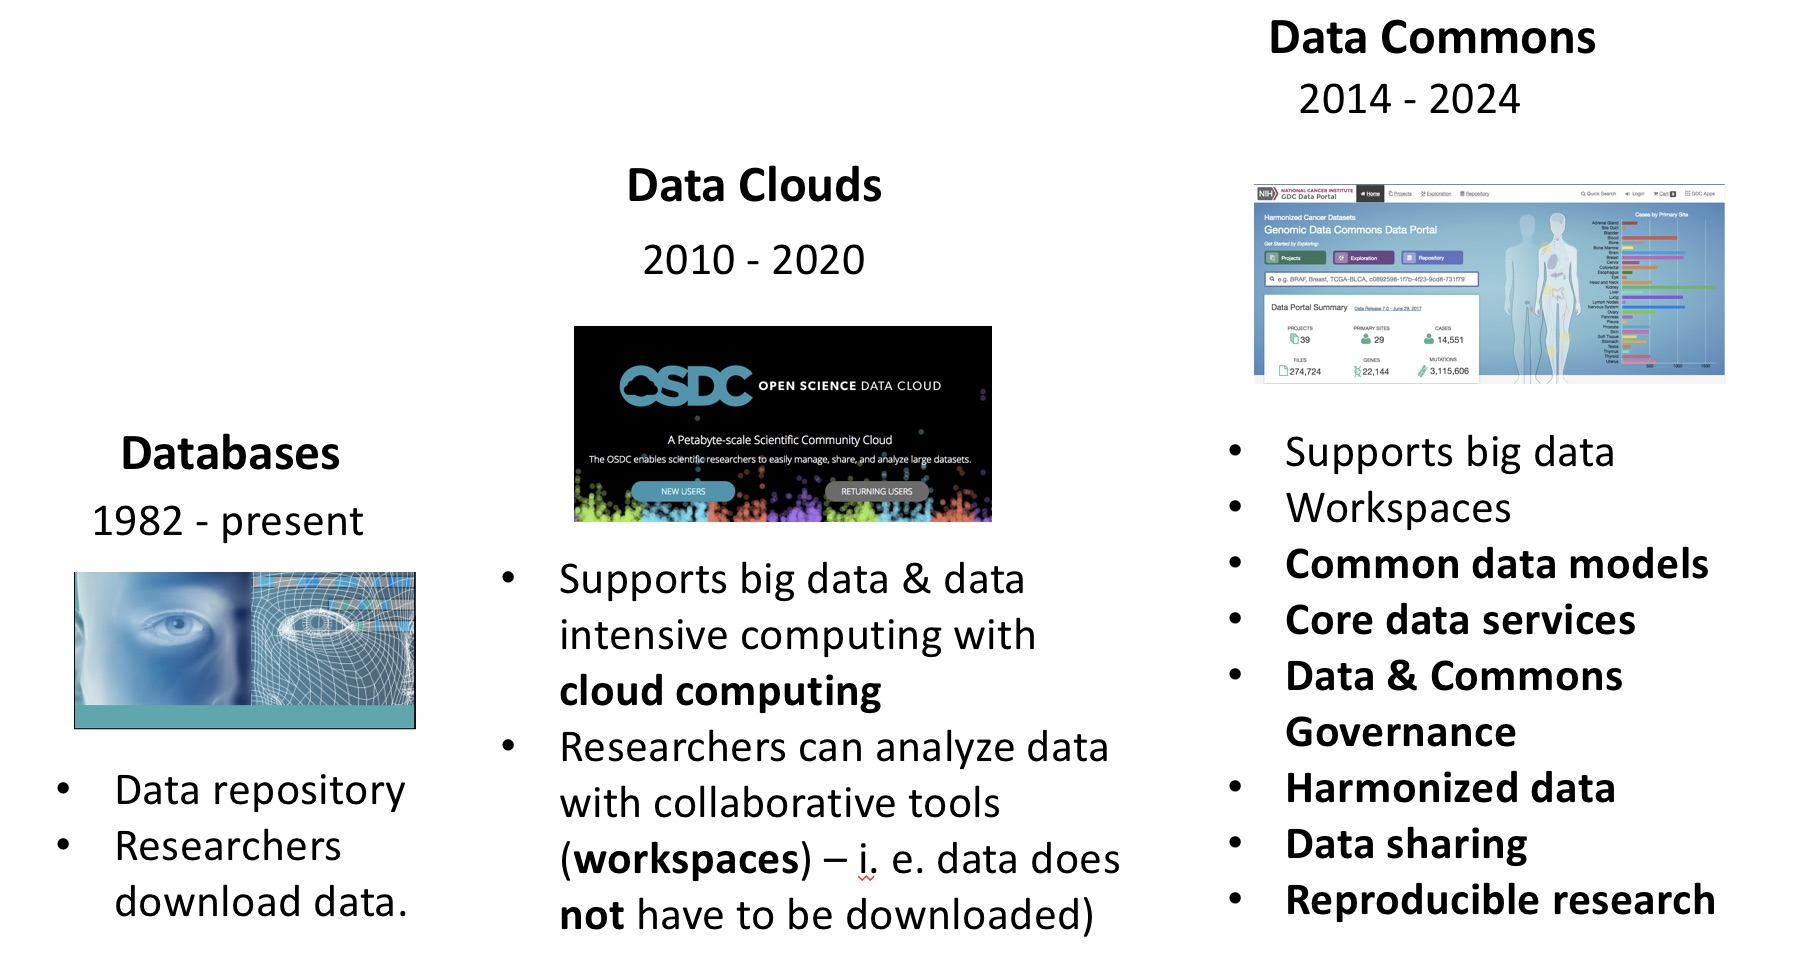 db-to-data-commons.jpg